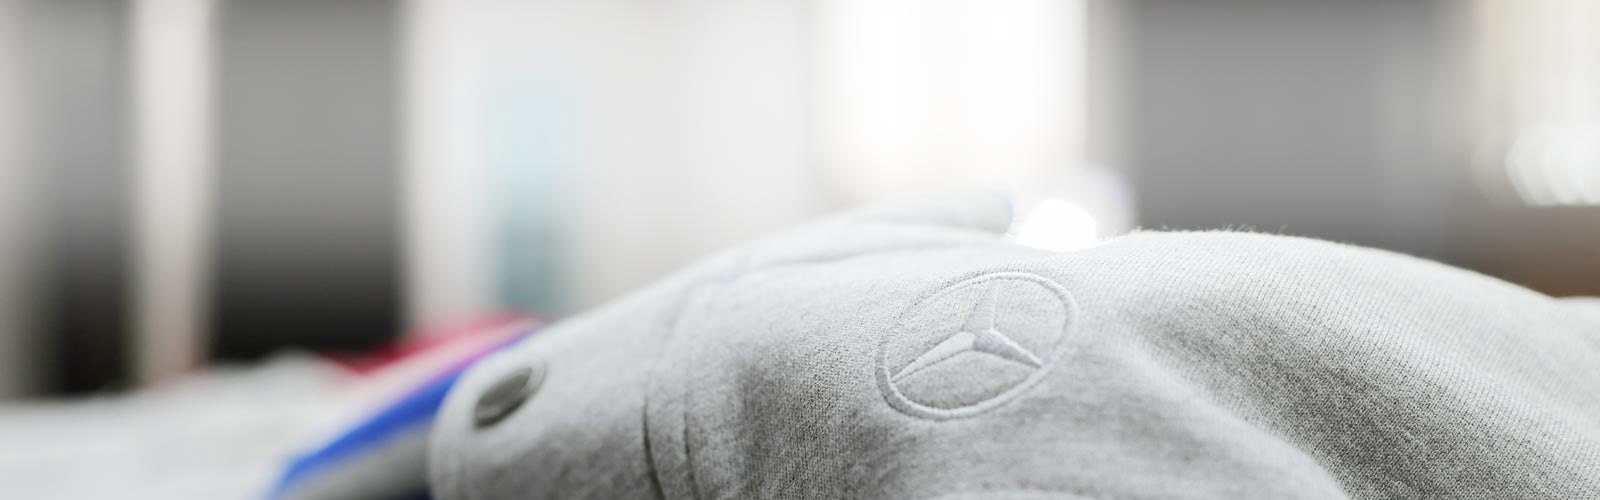 sags-apparel-banner